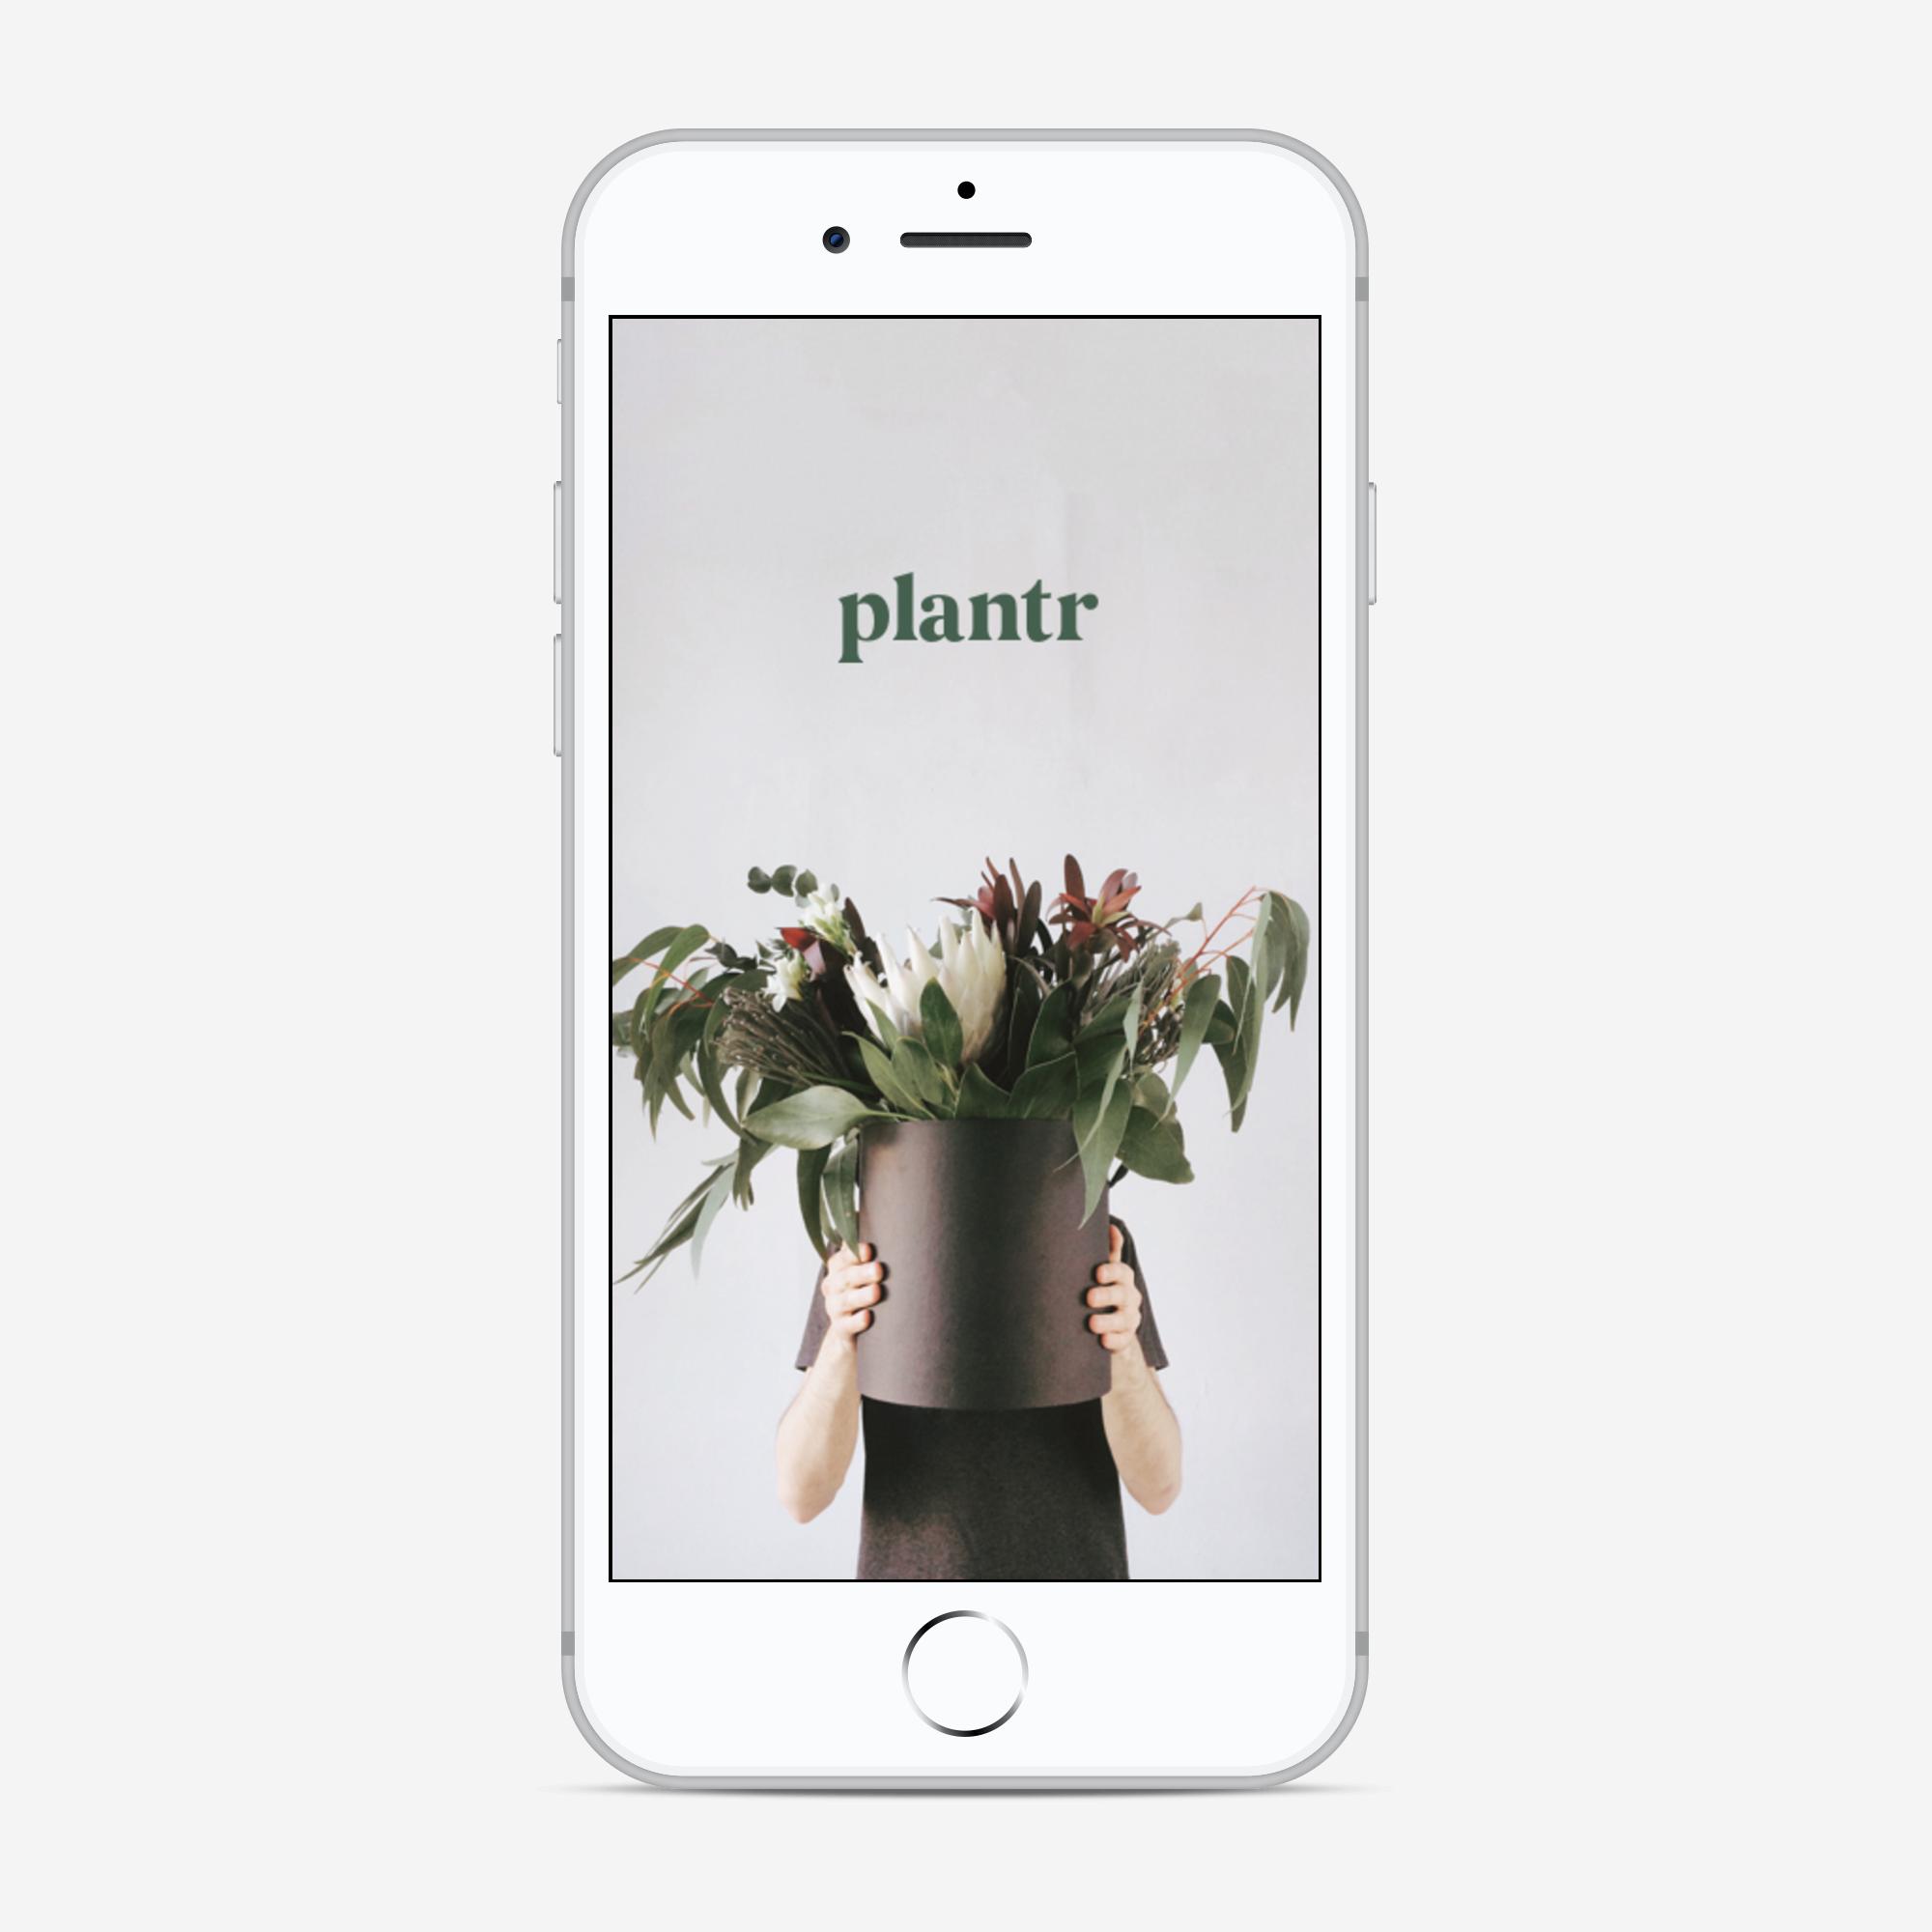 plantrloadscreen_iphone8silver_portrait copy.png